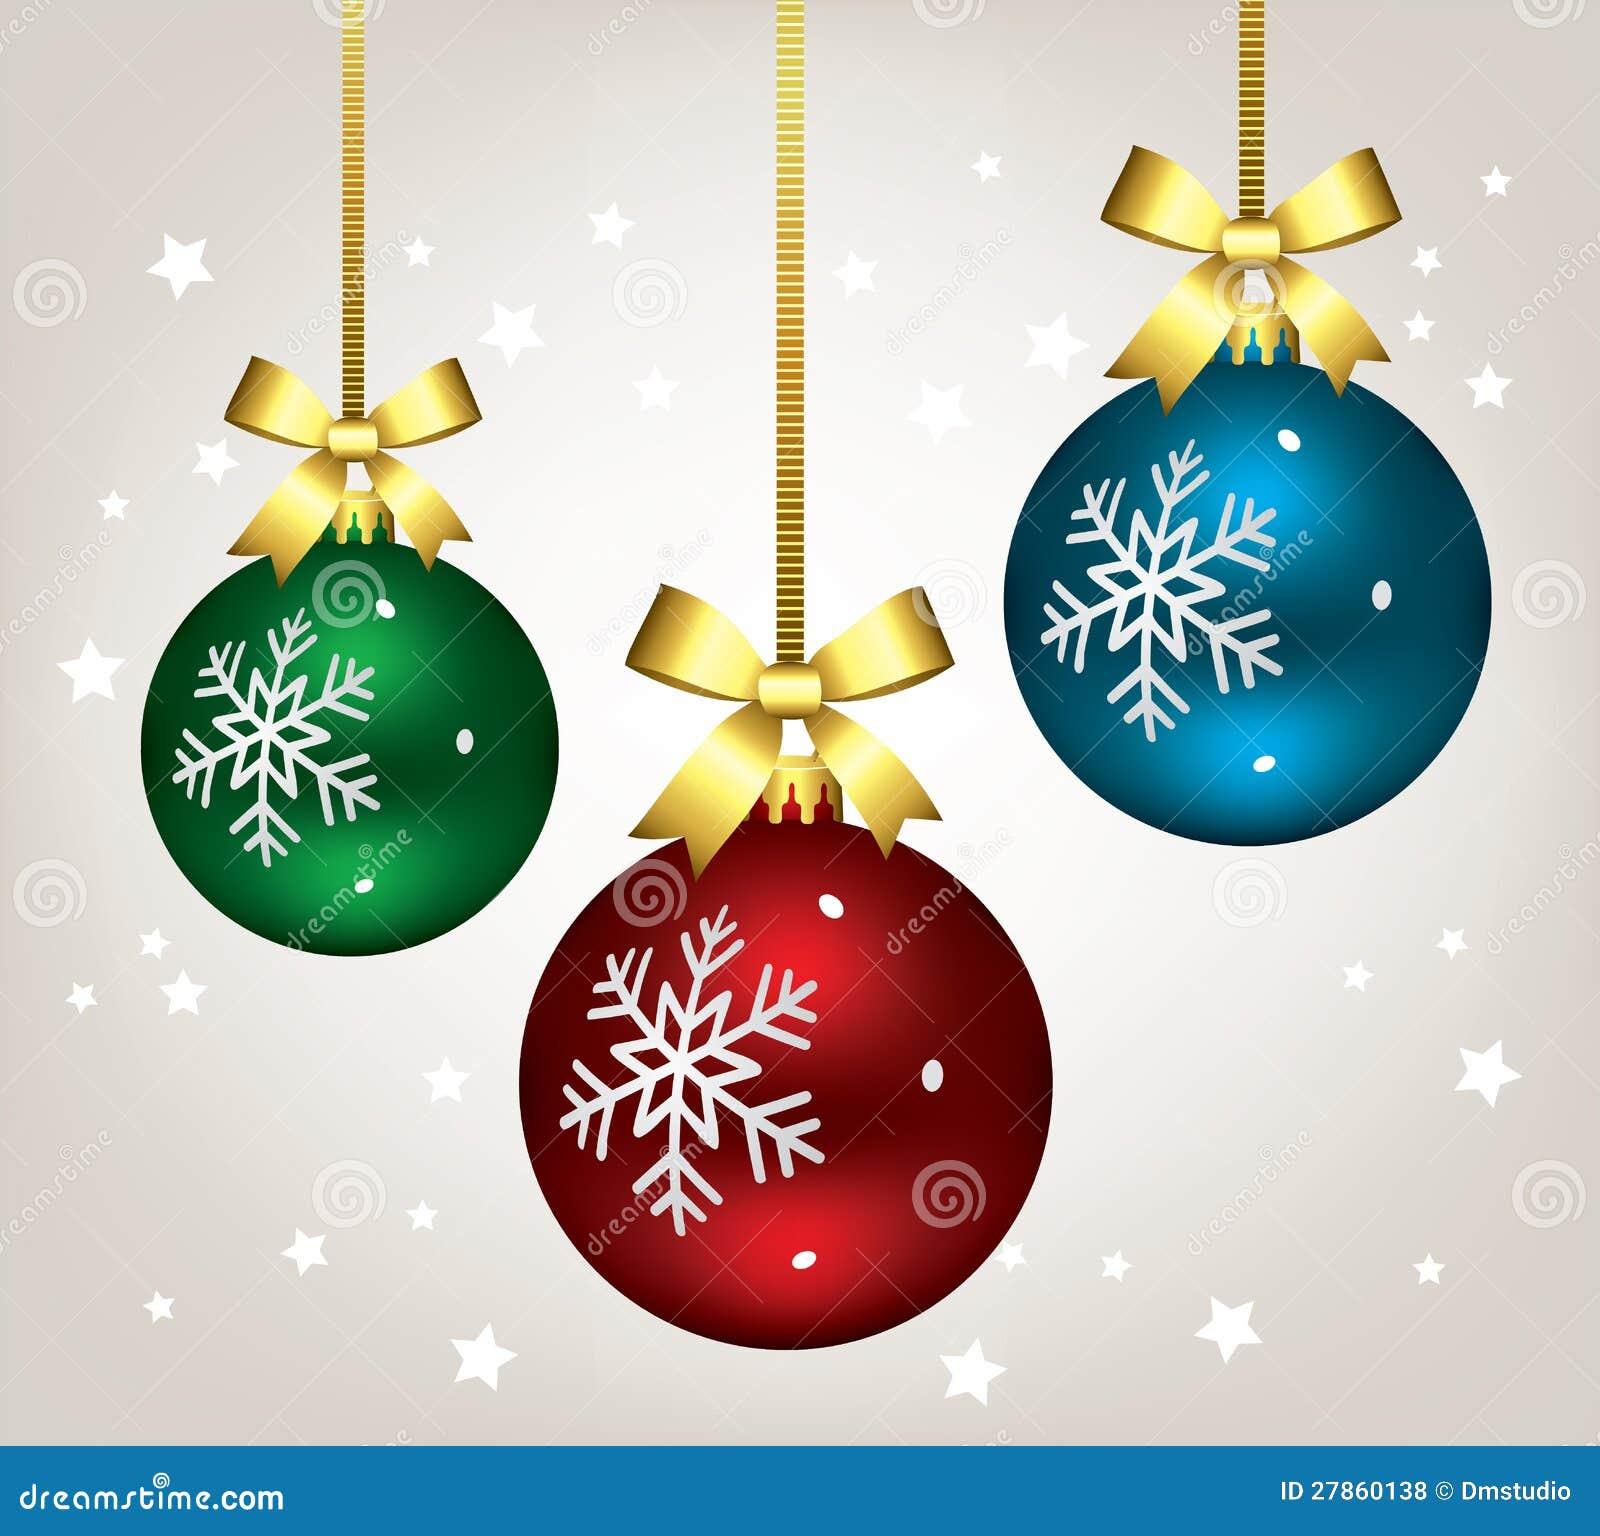 christmas images - photo #36